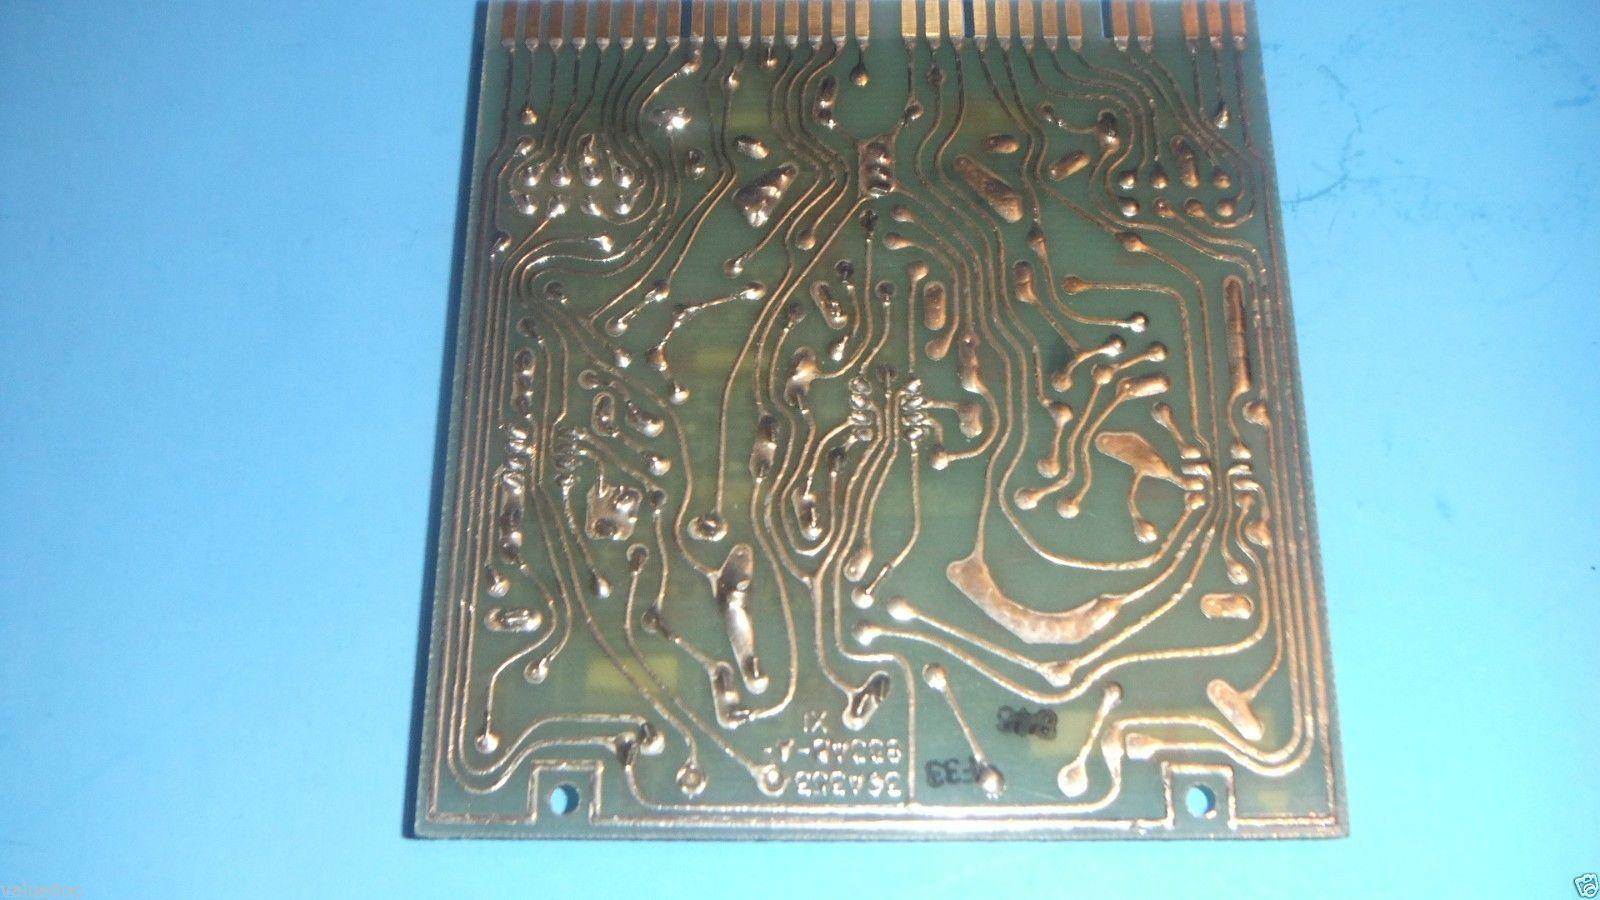 GE 193X277ACG01 CONTROL CIRCUIT BOARD GENERAL ELECTRIC  PC BOARD LEVEL DETECTOR